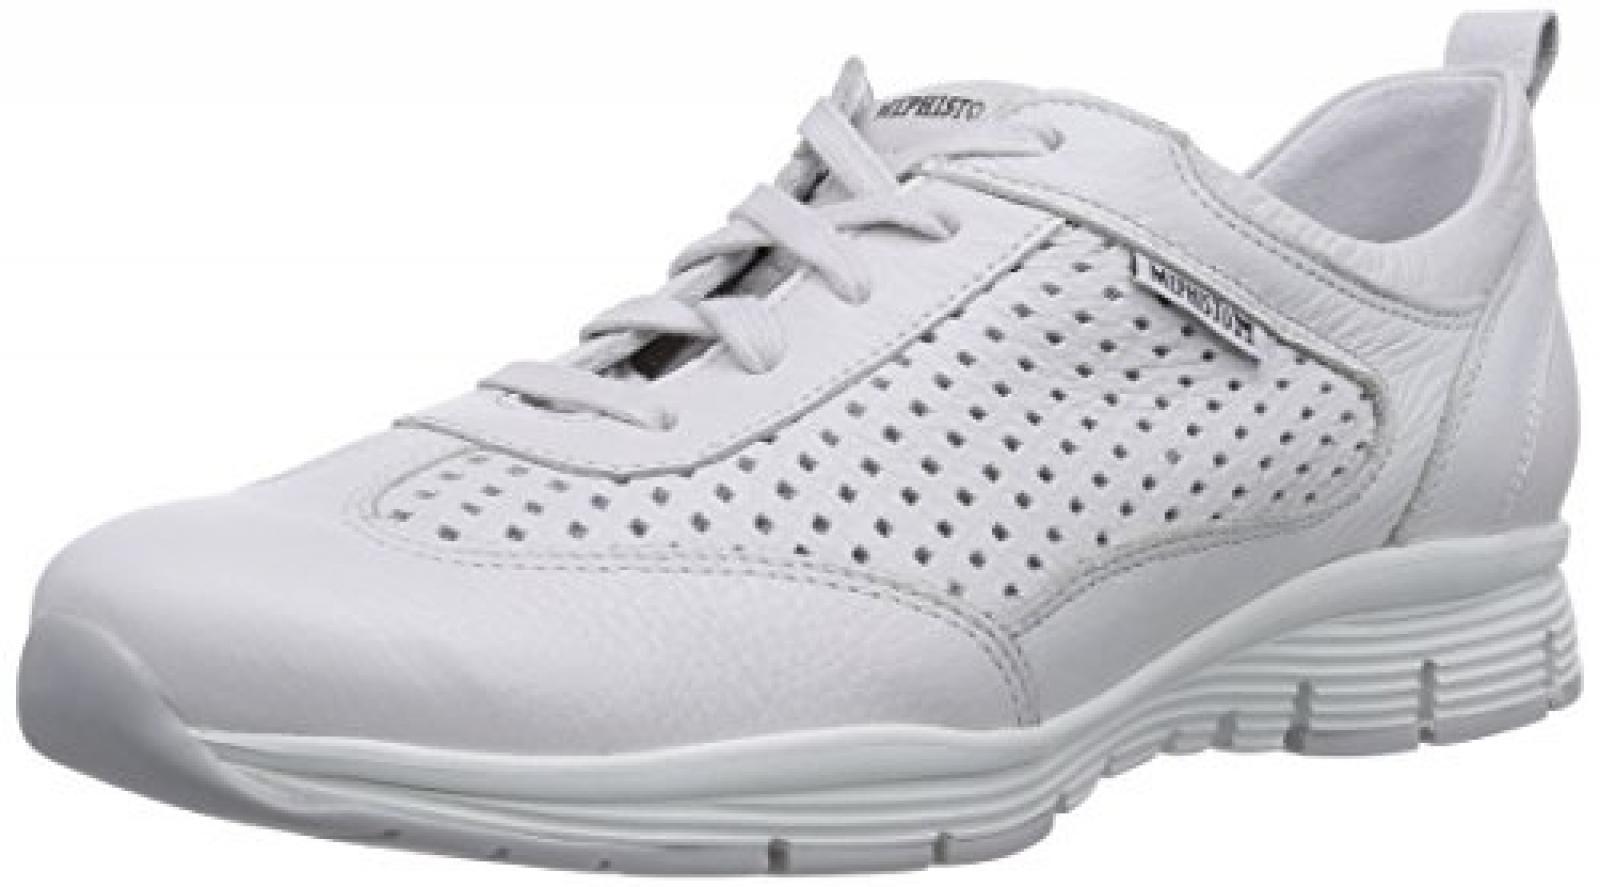 Mephisto YOANA SWEET 5830 Damen Sneakers